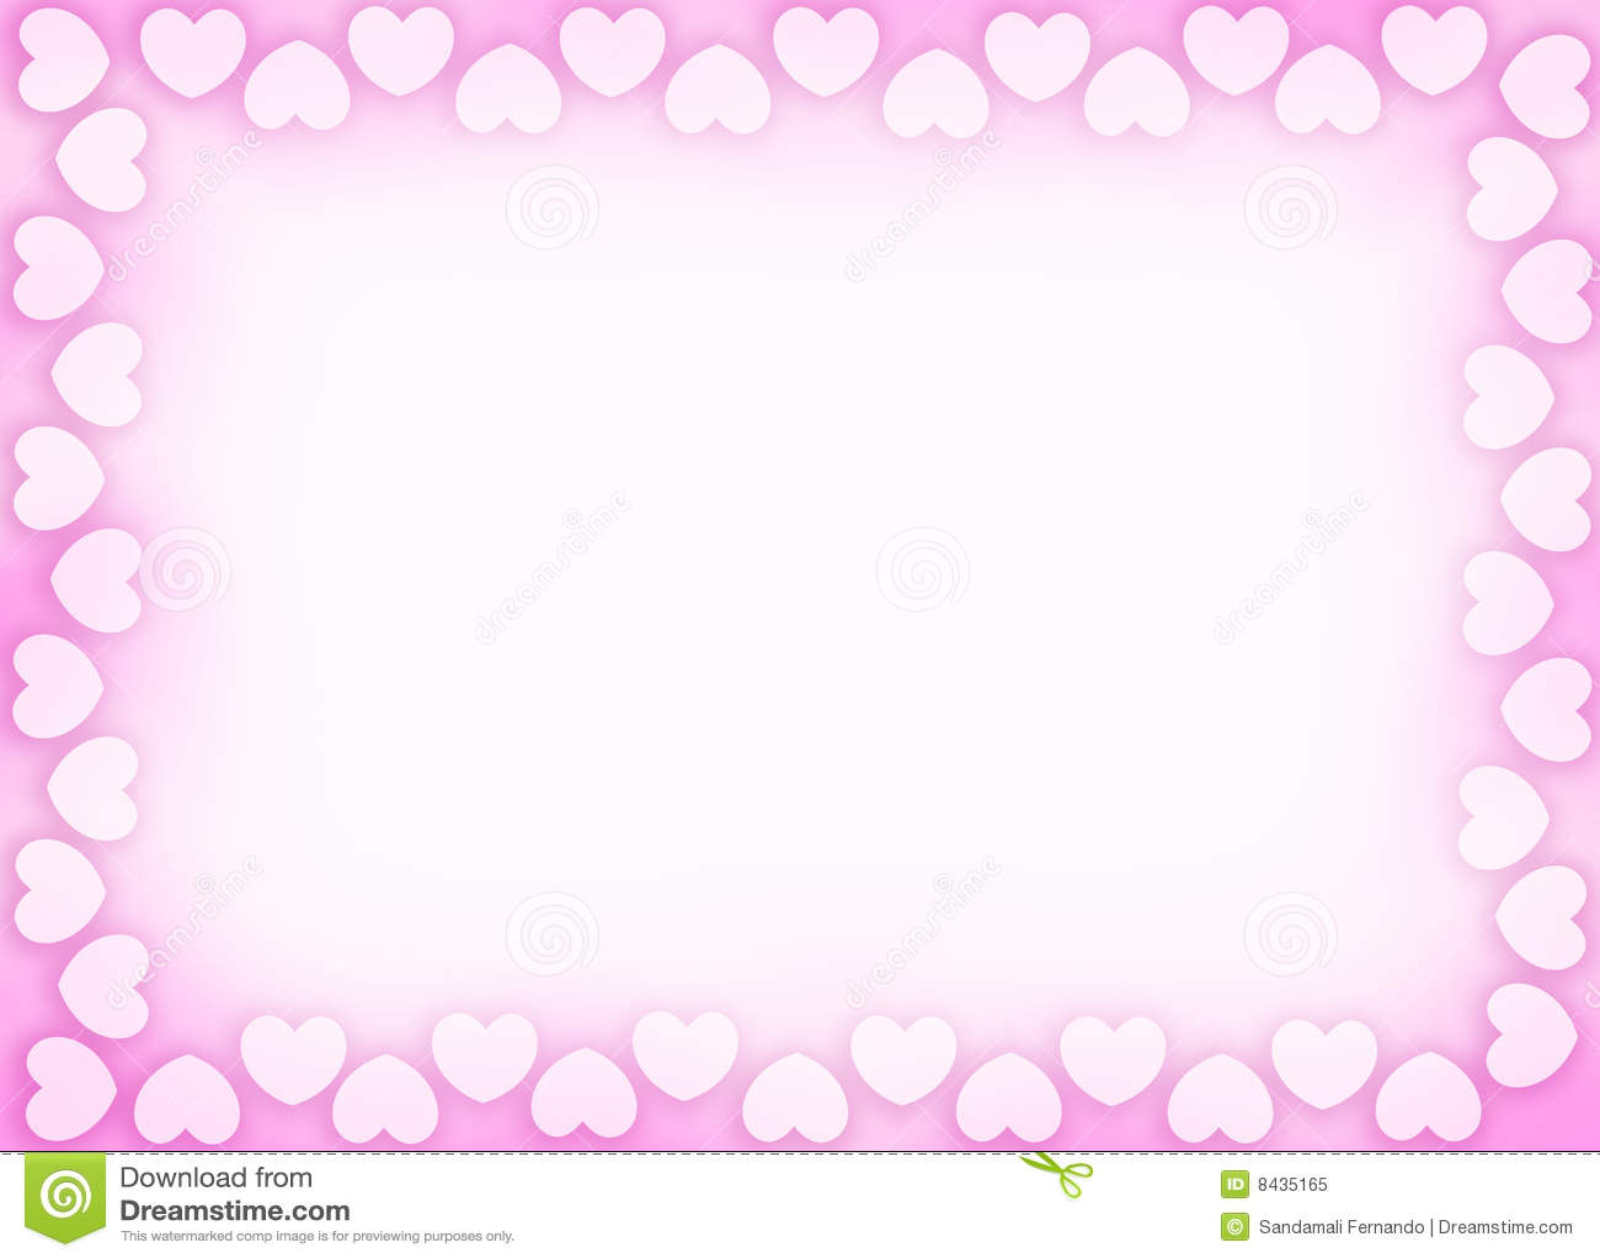 Hearts Border / Frame Royalty Free Stock Photo - Image: 8435165